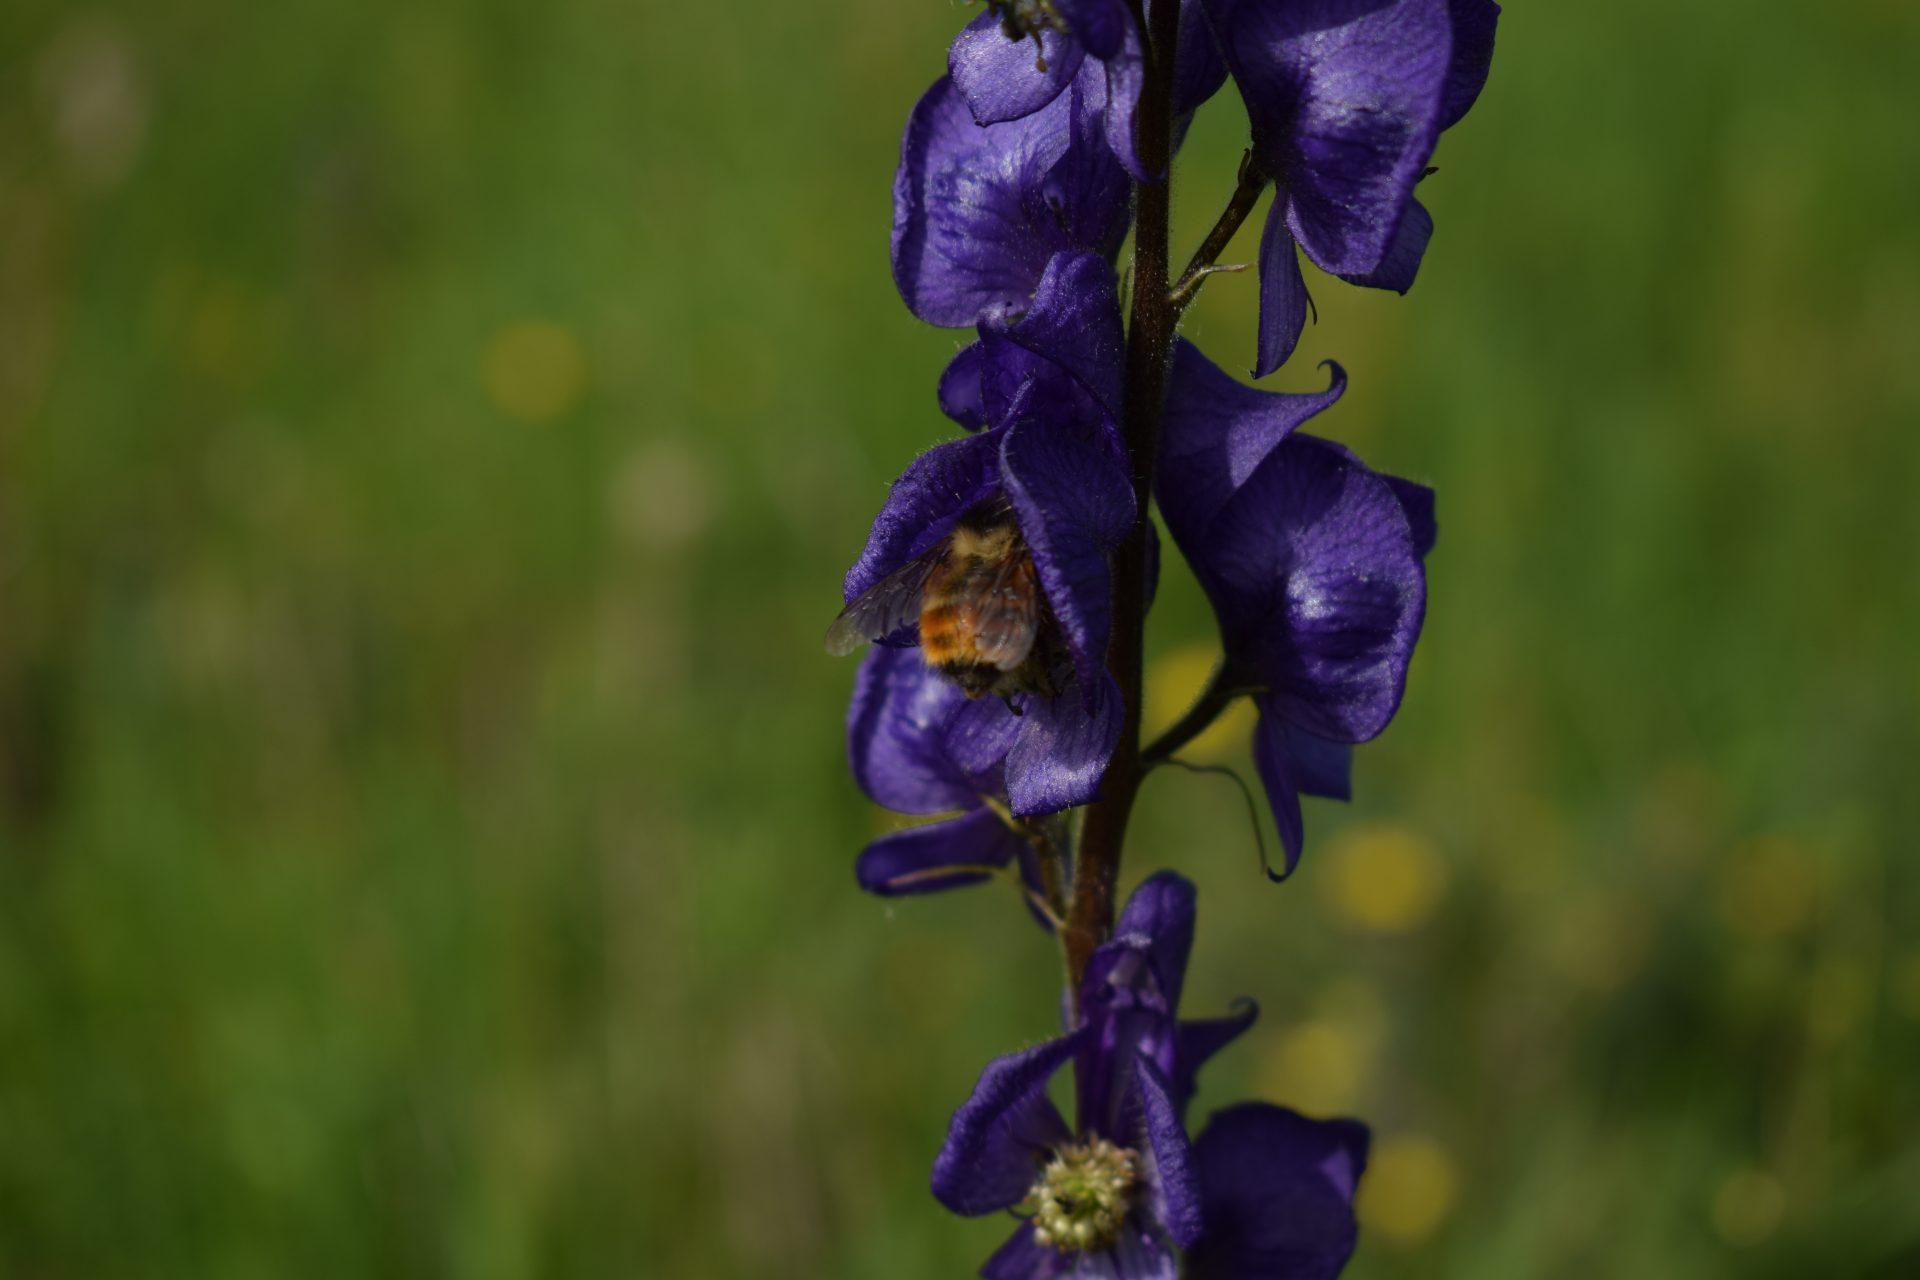 bumblebee butt sticking out of a purple flower